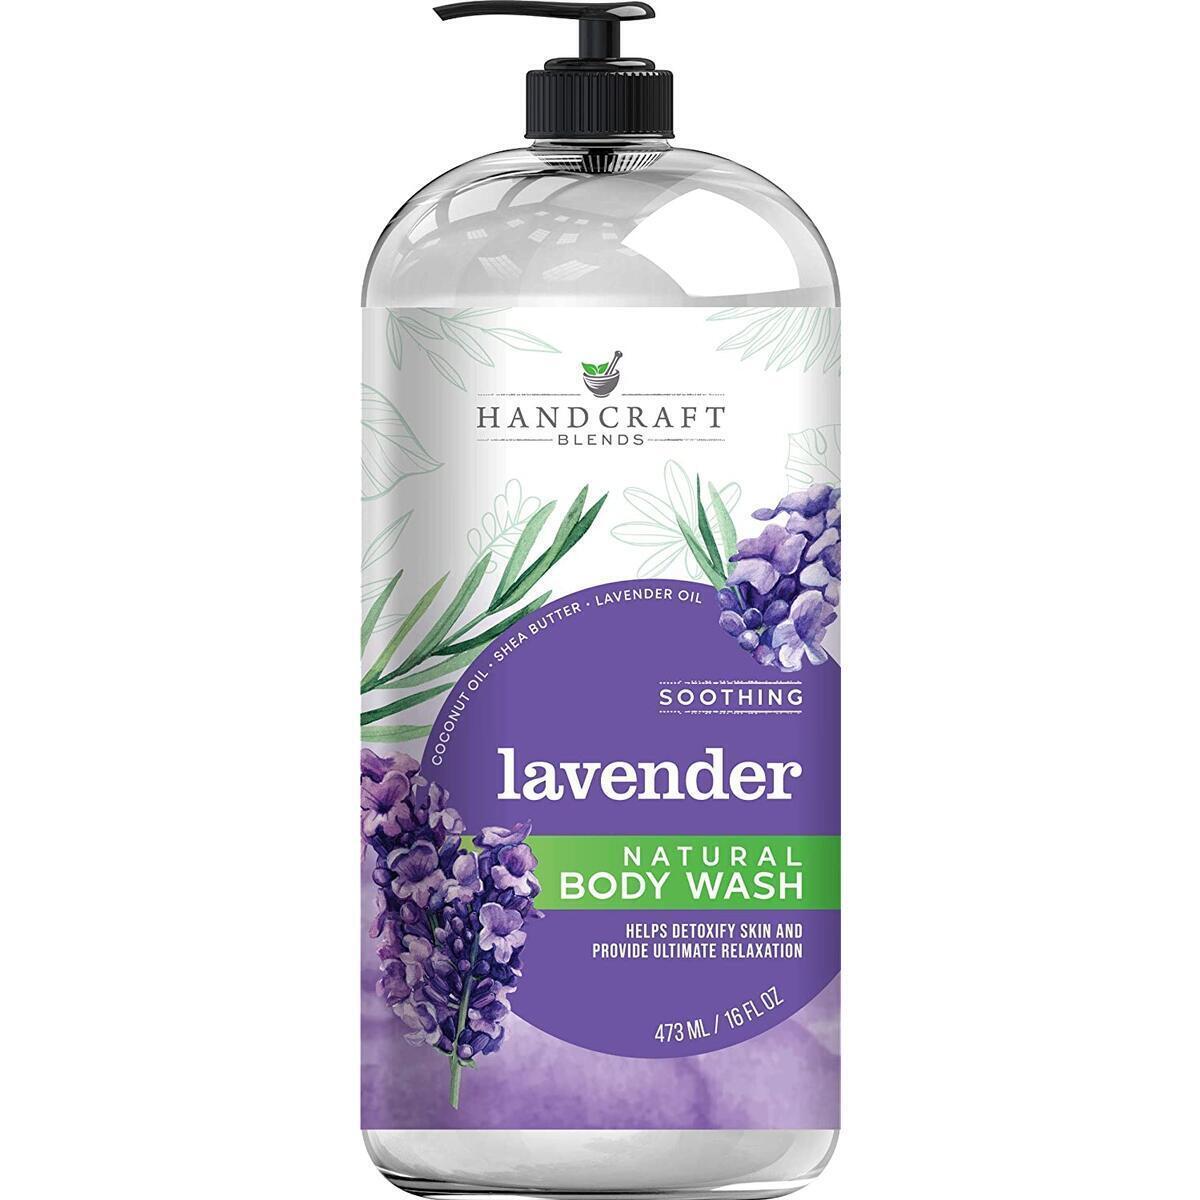 Handcraft Lavender Body Wash 16 oz